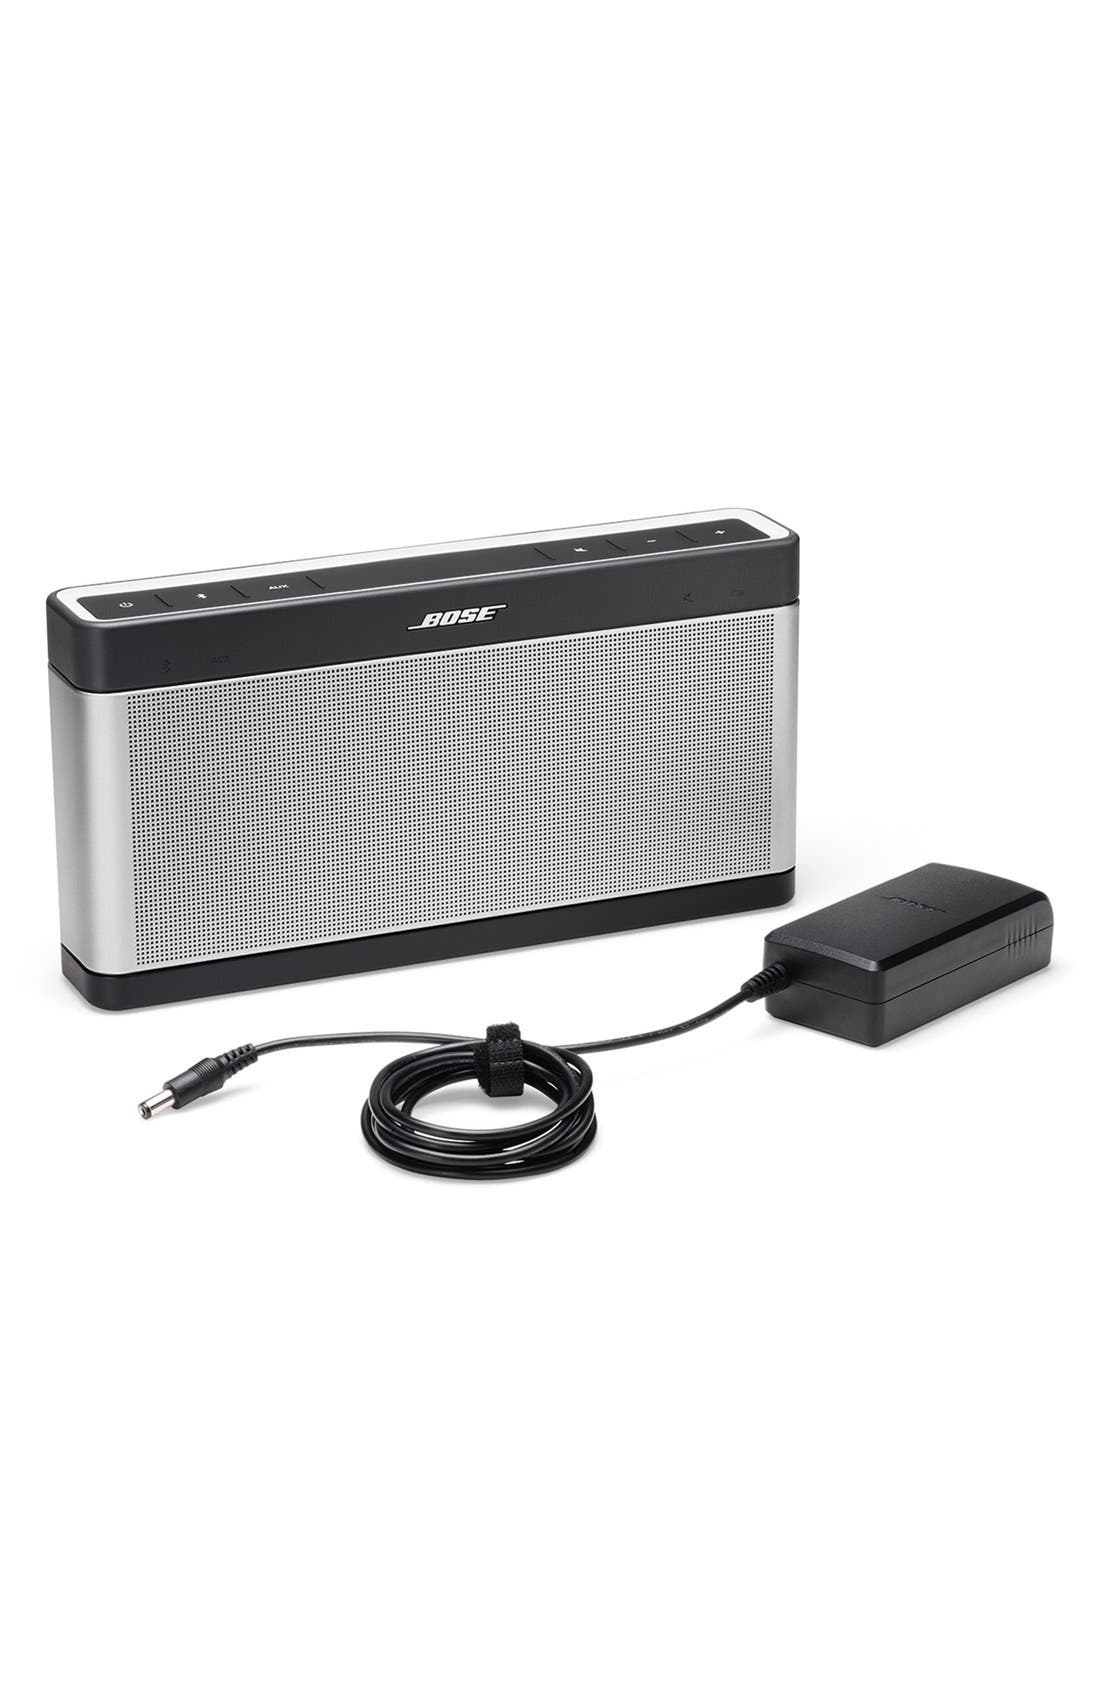 Alternate Image 2  - Bose® SoundLink® Bluetooth® Mobile Speaker III